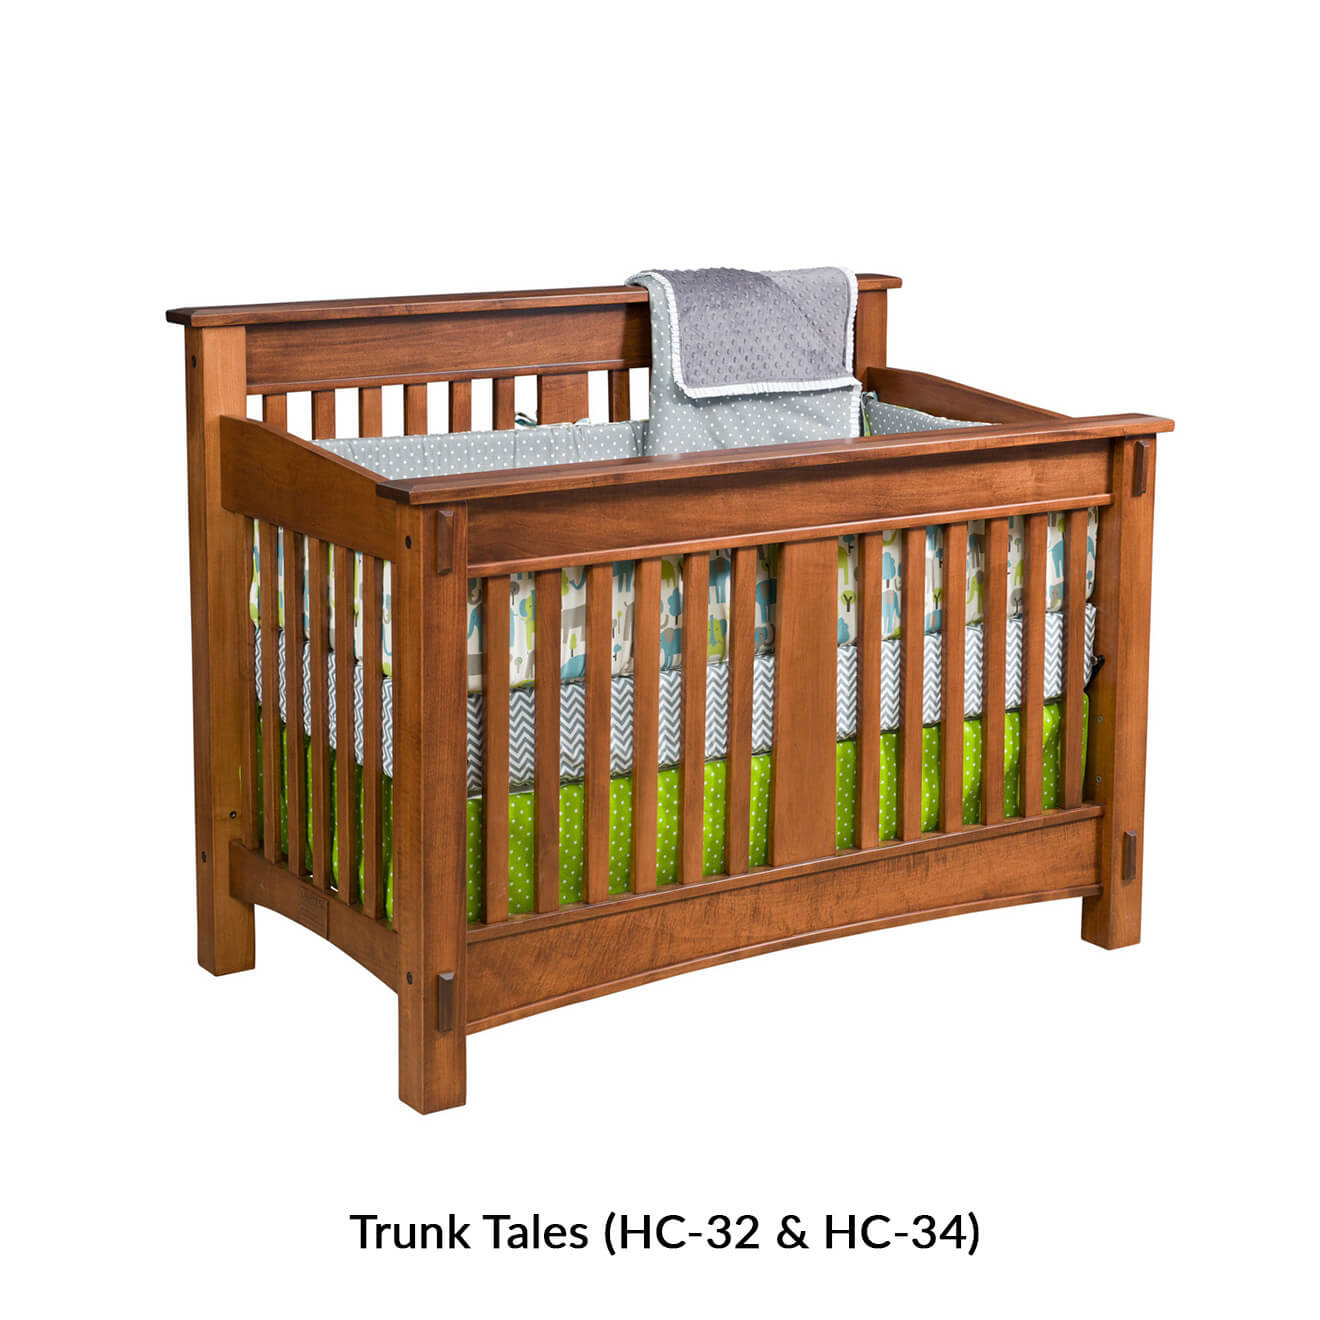 31.-trunk-tales-hc-32-hc-34-.jpg